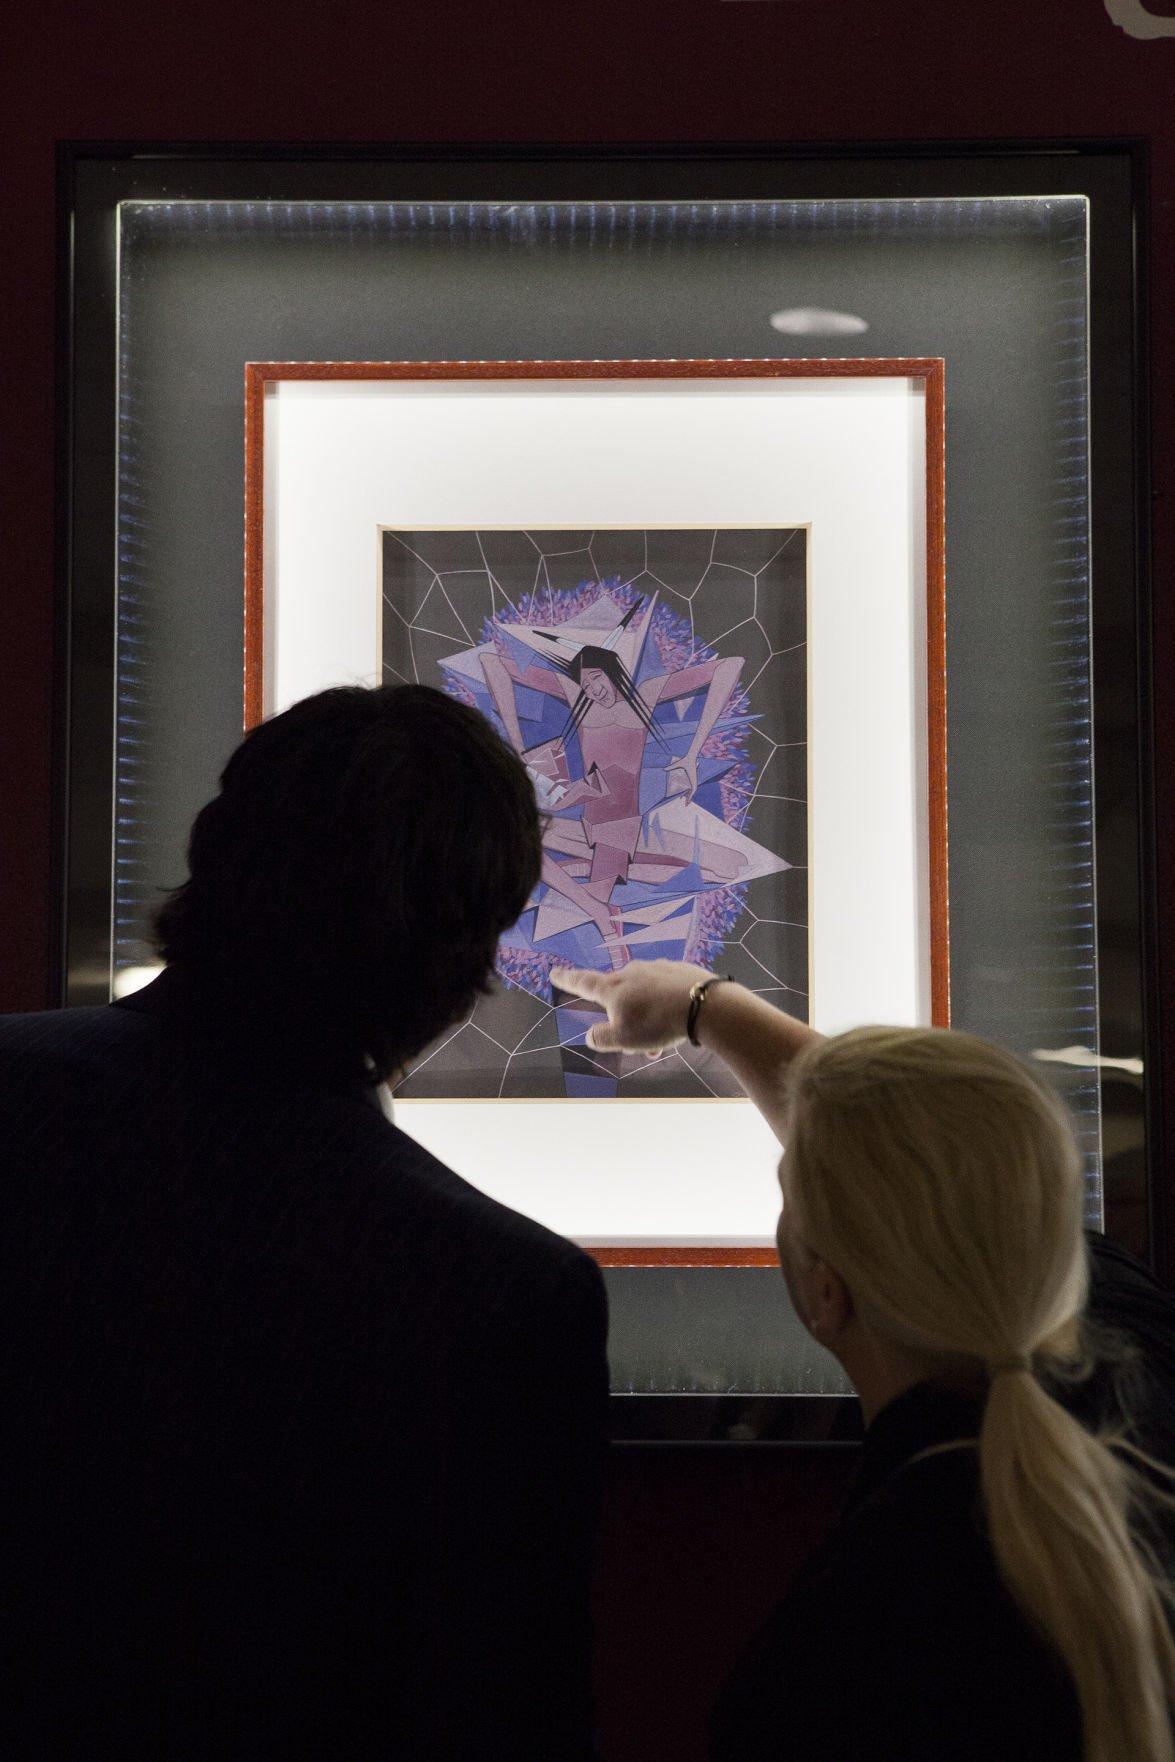 South dakota meade county howes - Ruth Brennan Exhibit Celebrates 100th Anniversary Of Oscar Howe S Birth